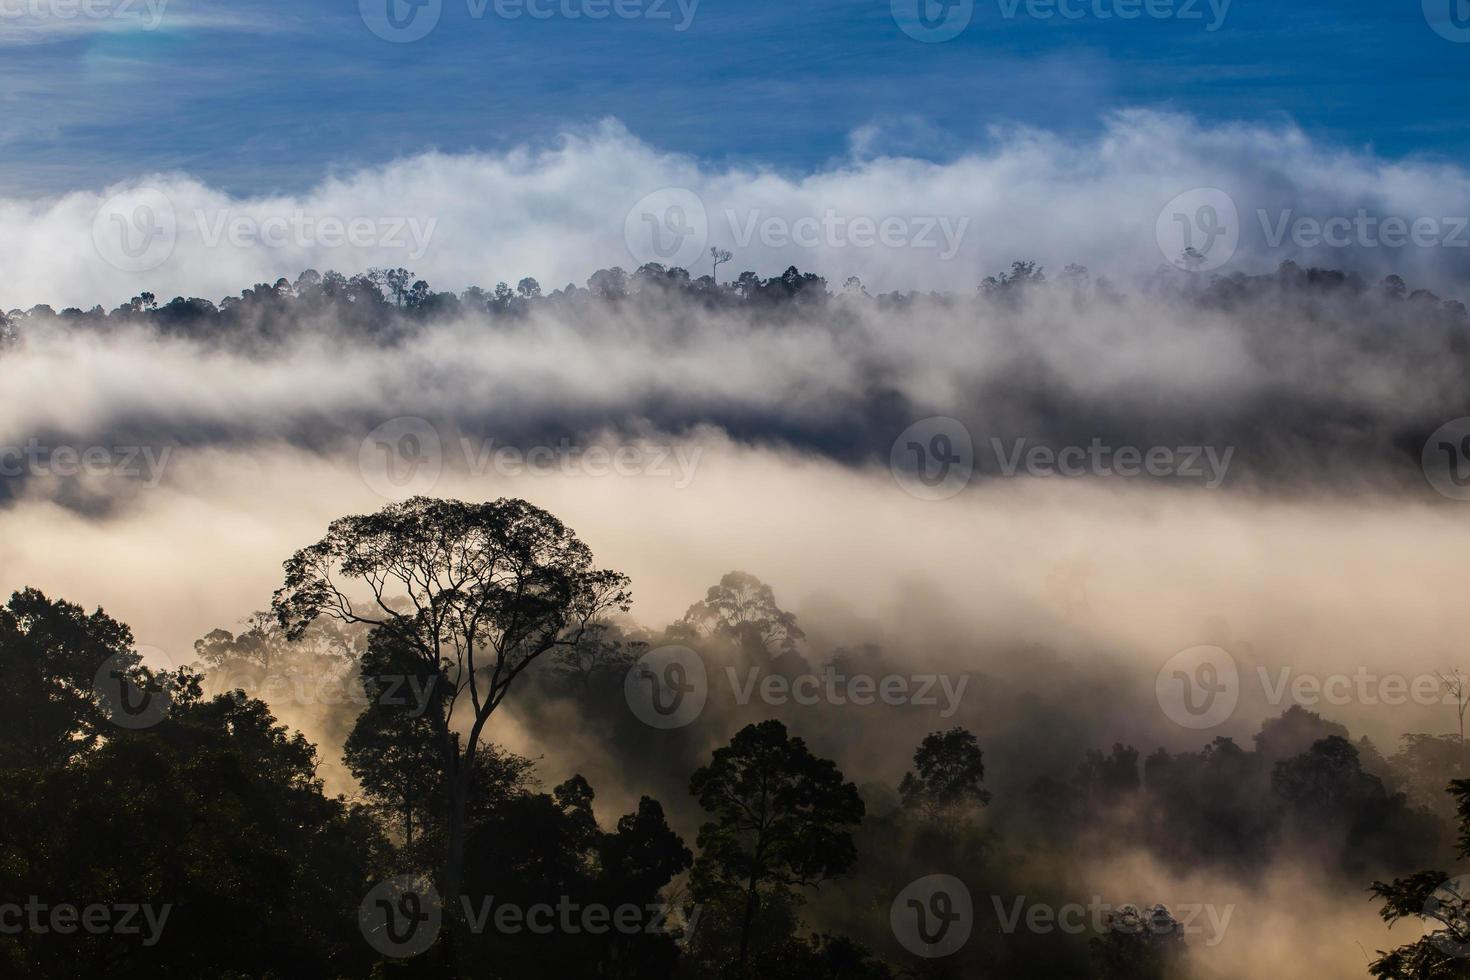 hala-bala narathiwas morgonljuset landskapsvy (regnskogar foto